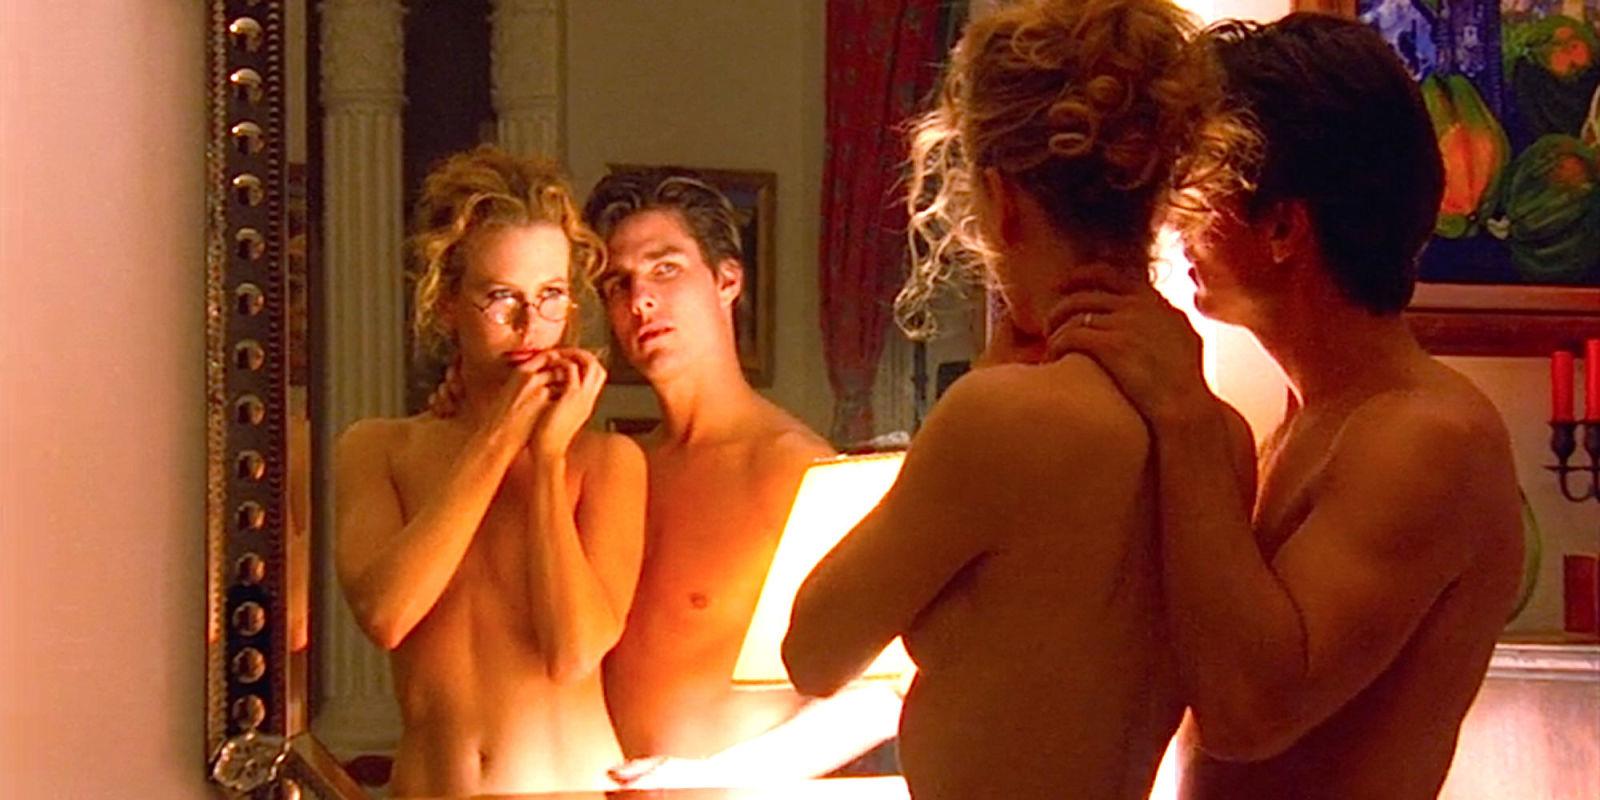 best movie sex scene video Jul 2015  CentricTV.com has narrowed down just eight of the steamiest sex scenes in black  film.